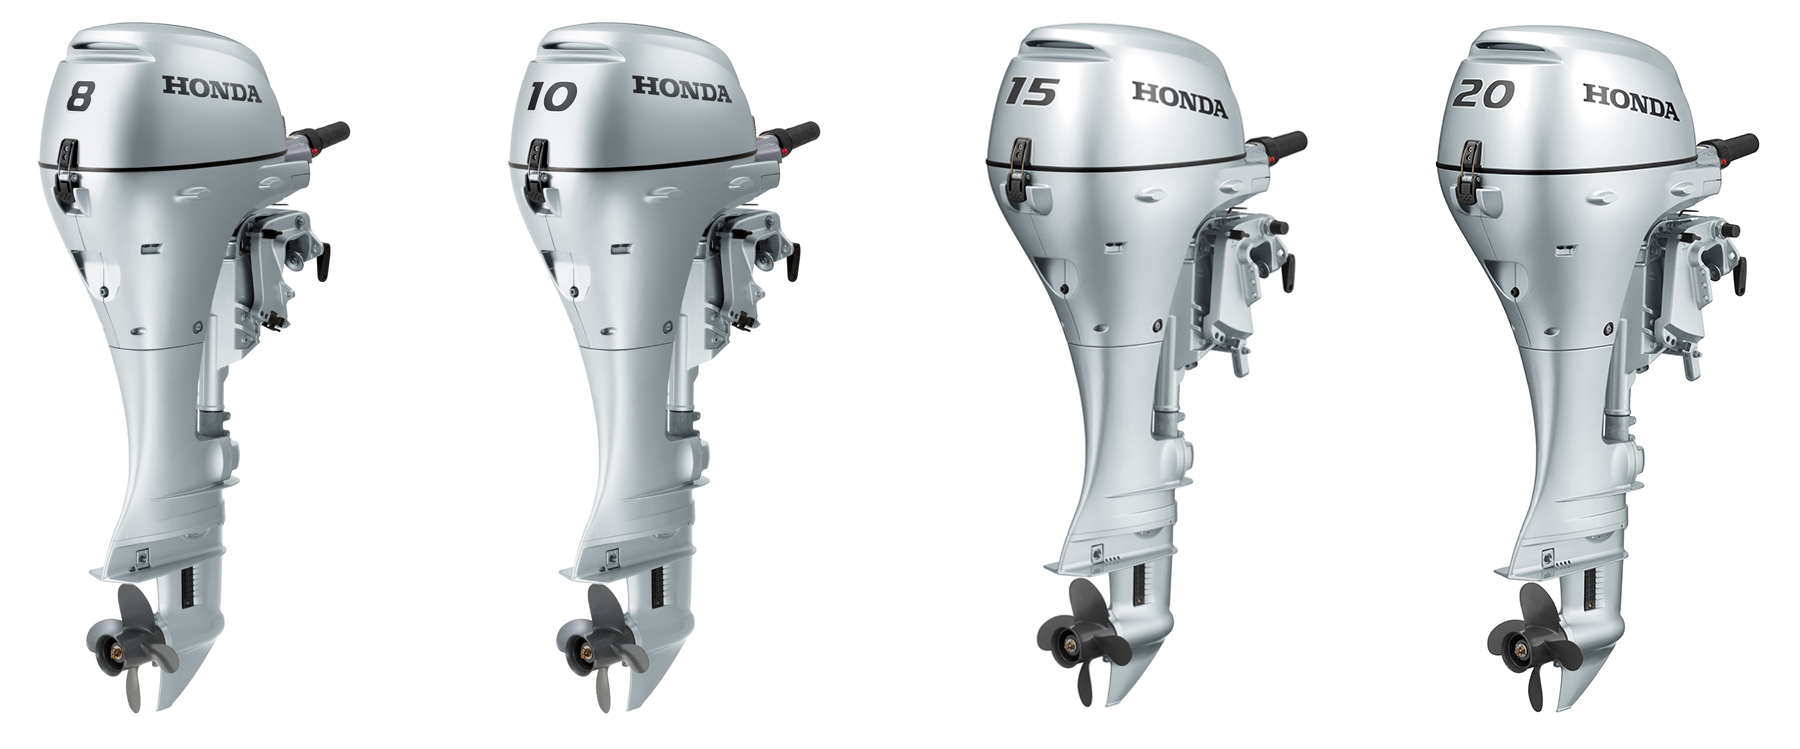 Honda outboard range.jpg